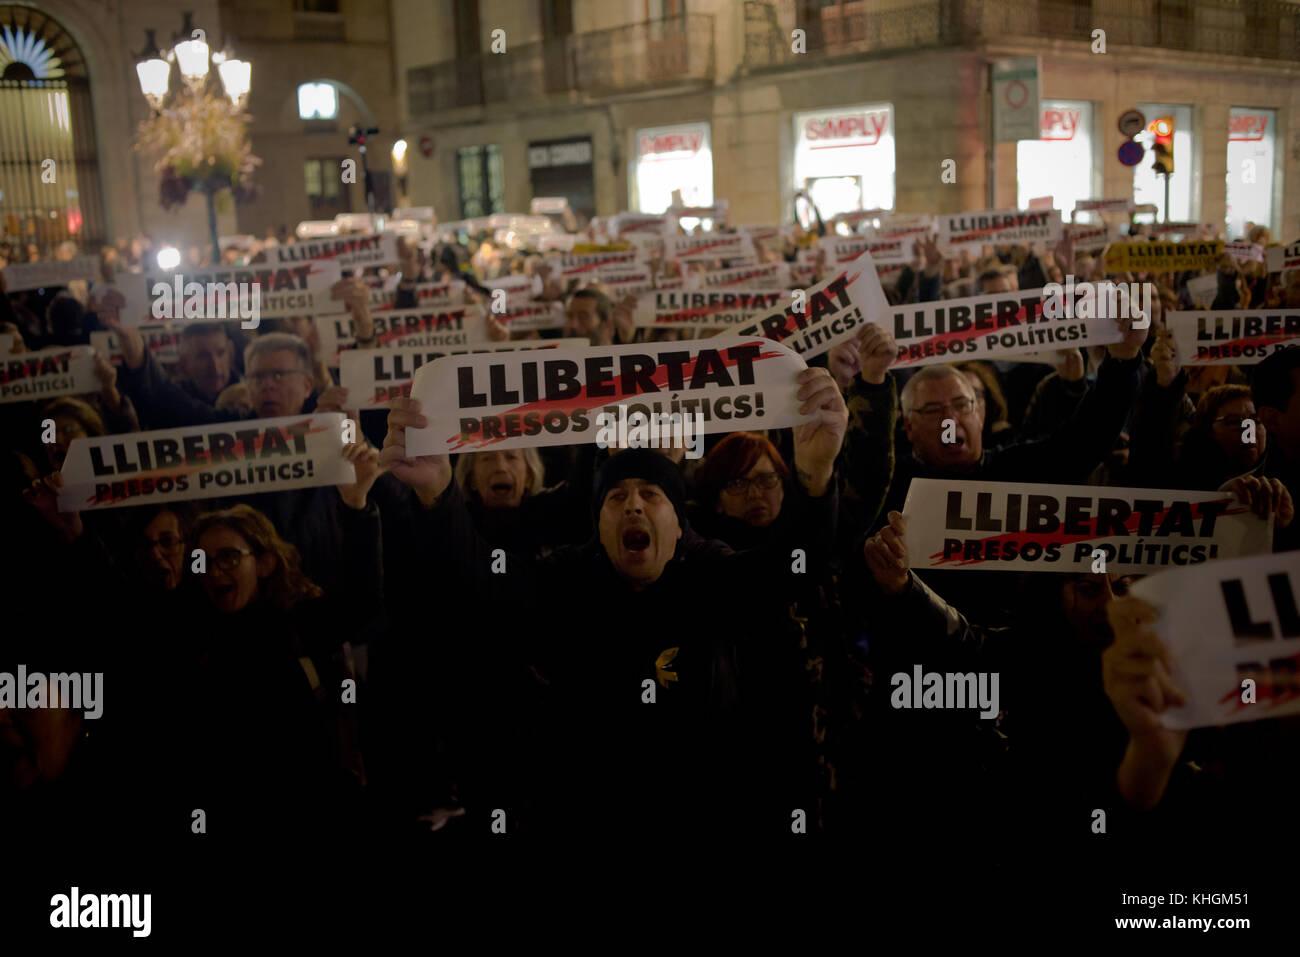 Barcelona, Catalonia, Spain 16 November, 2017 - In Barcelona demonstrators shout slogans and show banners demanding Stock Photo